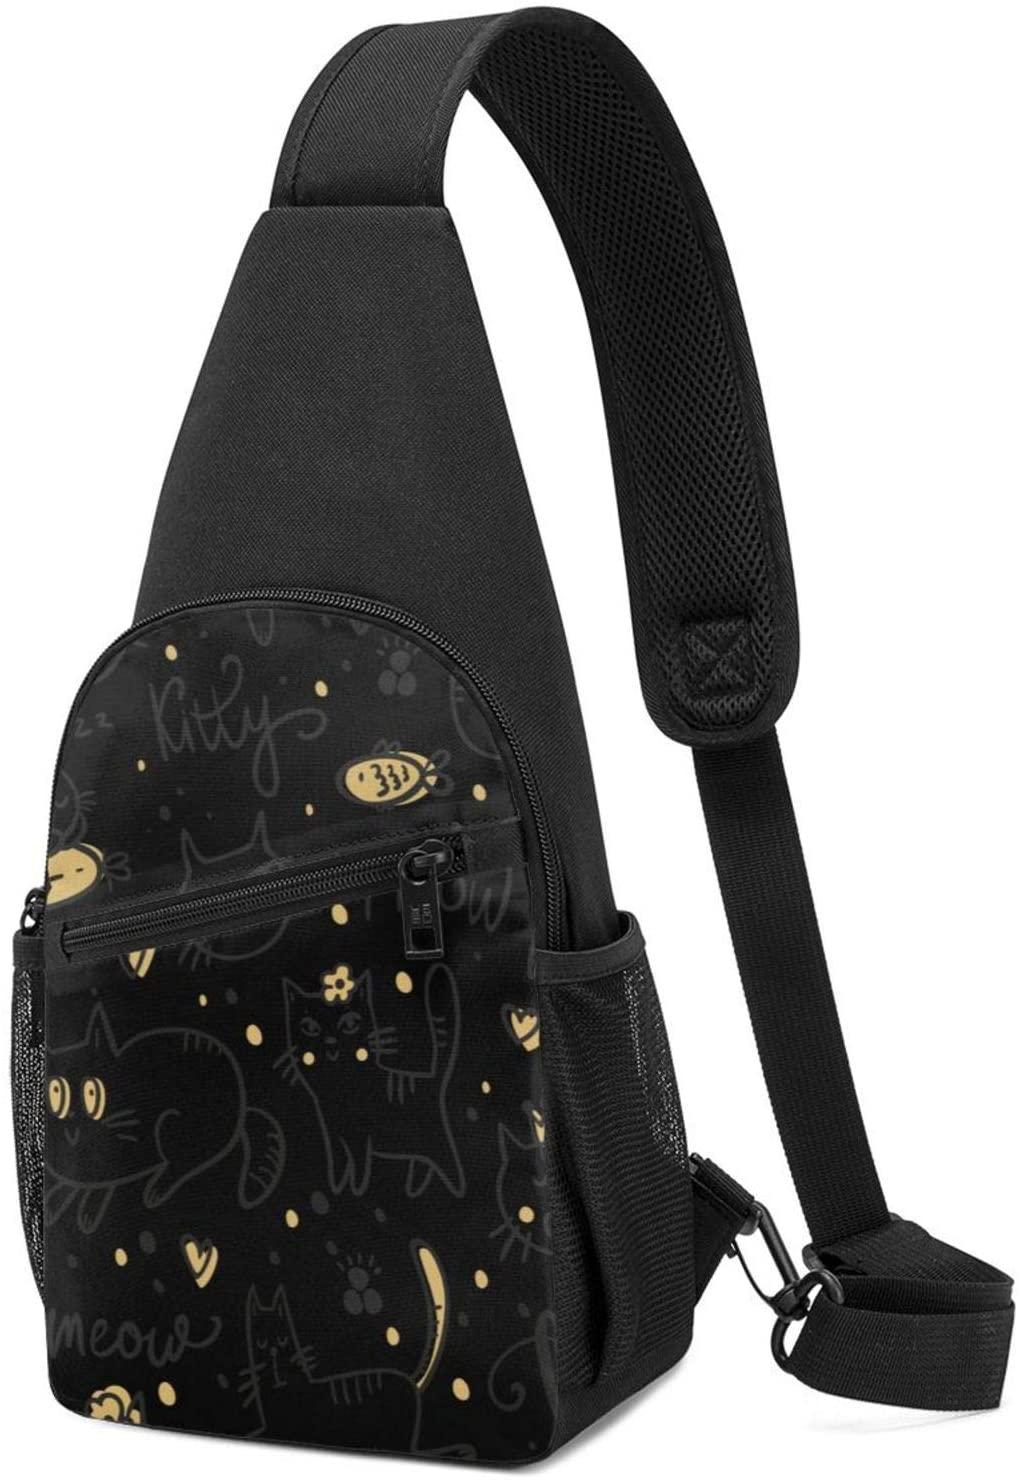 NiYoung Men Women Cute Kitty Meow Cat Sling Bag Fashion Crossbody Shoulder Bag Multipurpose Sling Bags Shoulder Backpack with Adjustable Strap